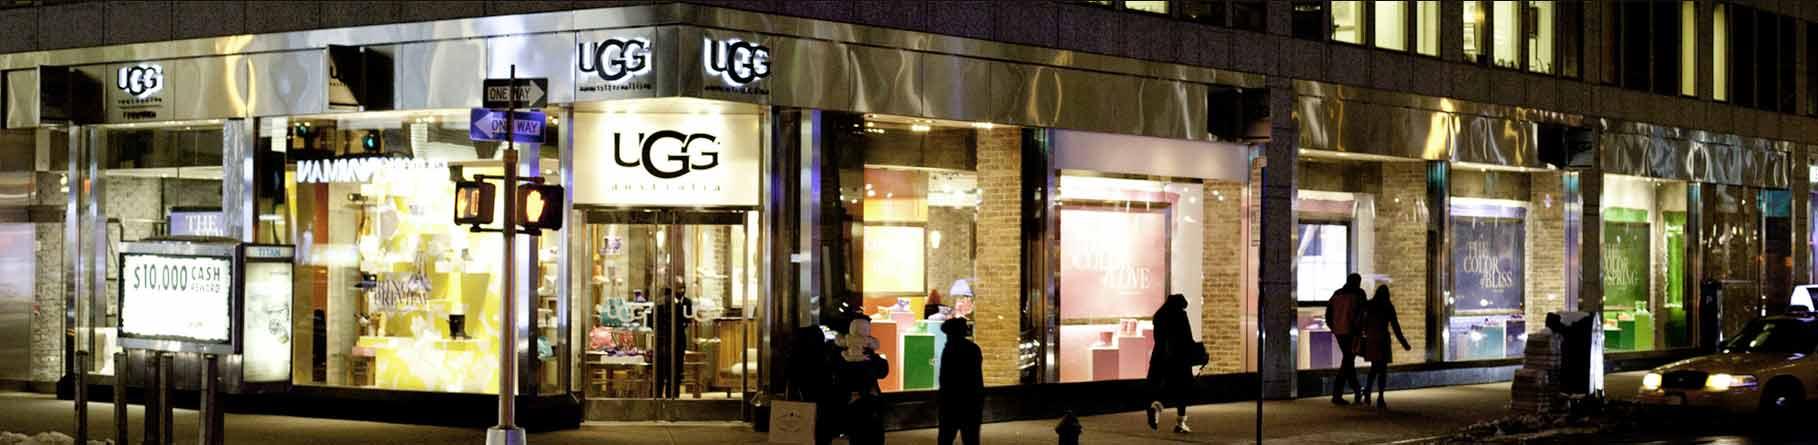 Ugg retail store on busy street corner